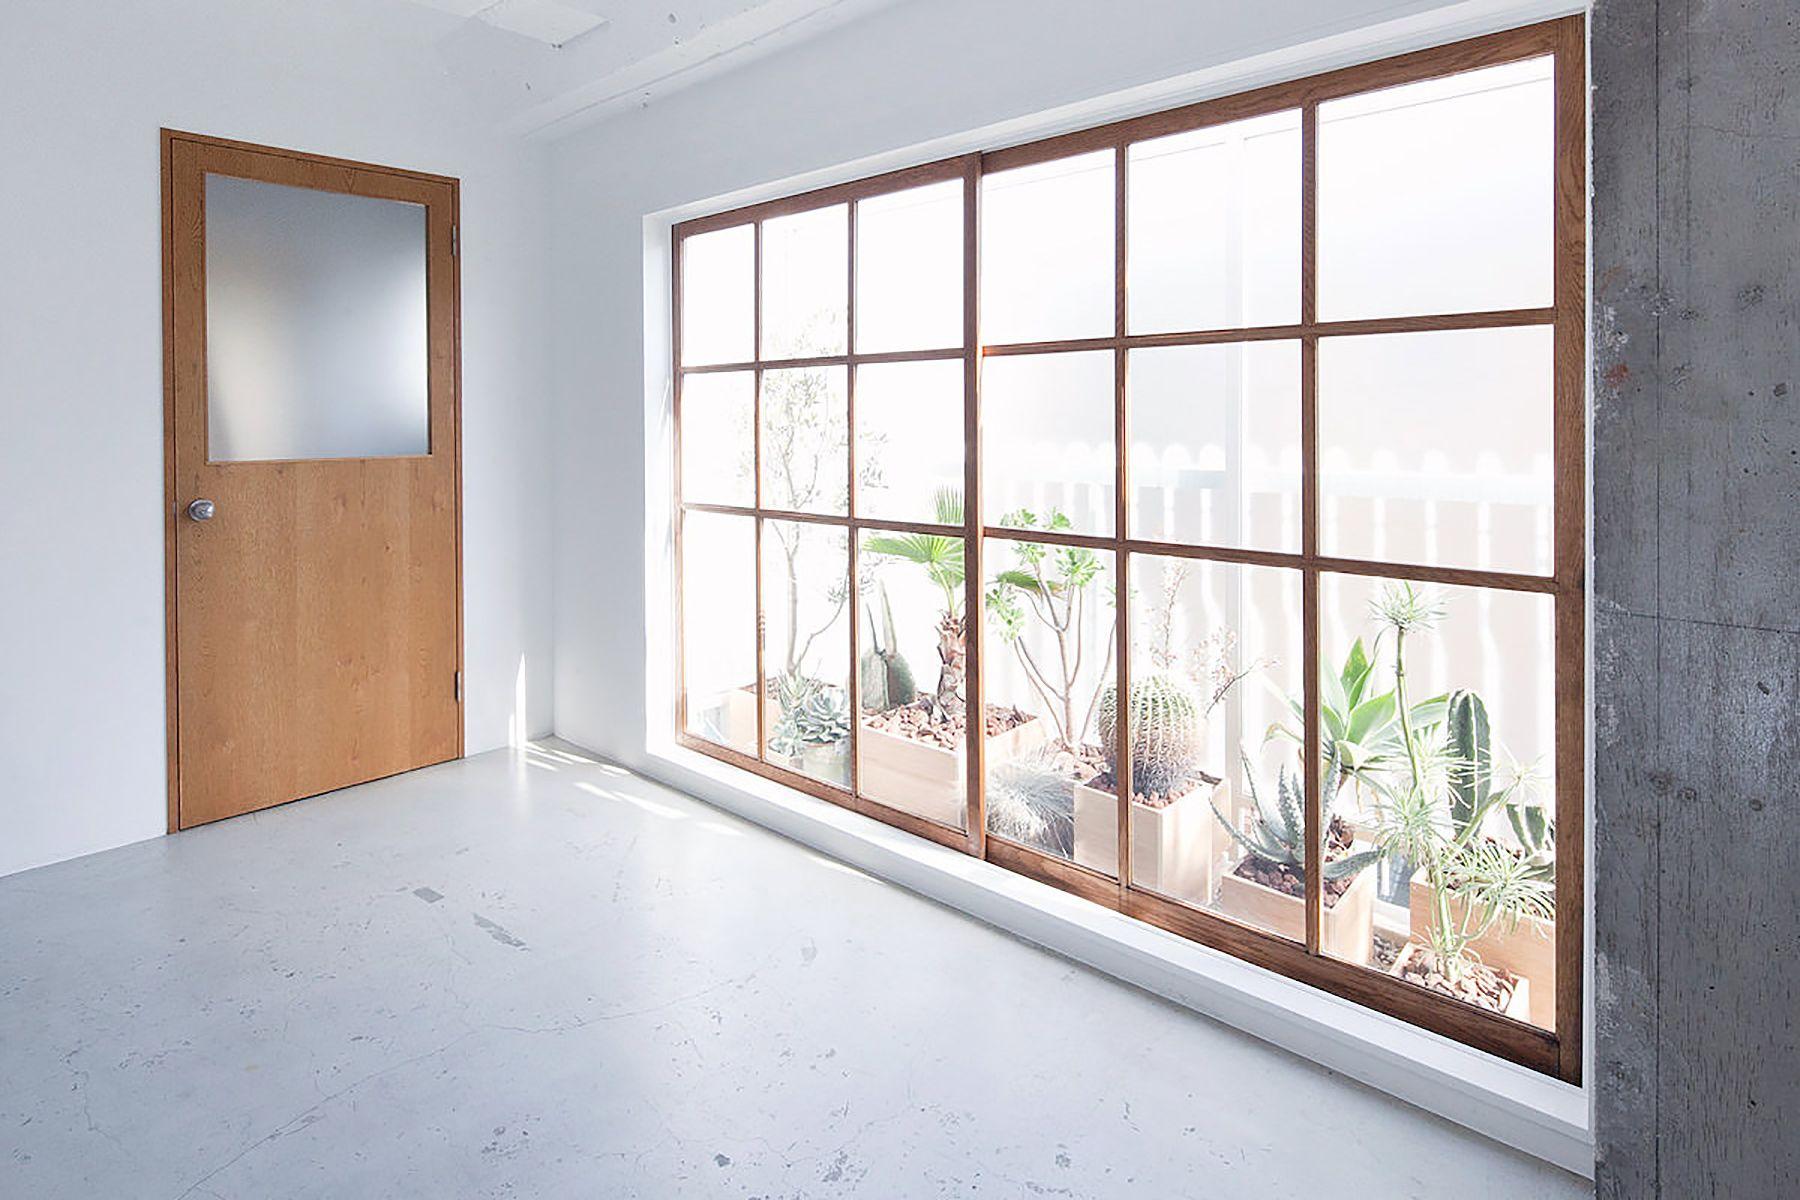 RE studio (アールイースタジオ)植物は季節により入替わります